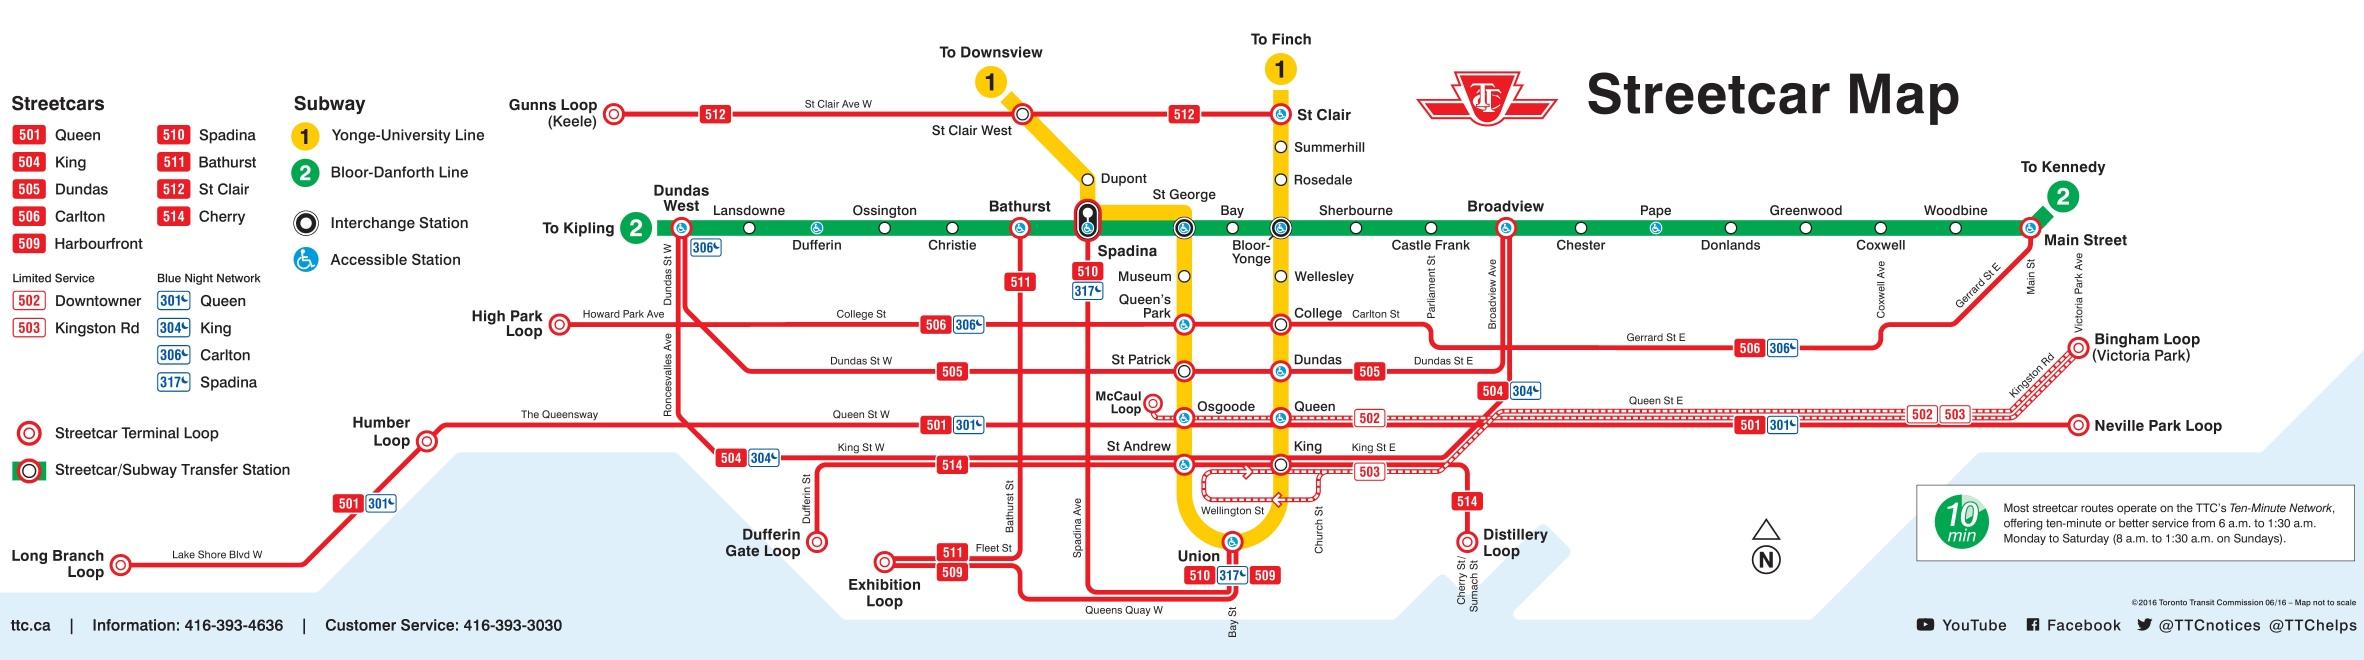 Toronto Streetcar Map Toronto streetcar map